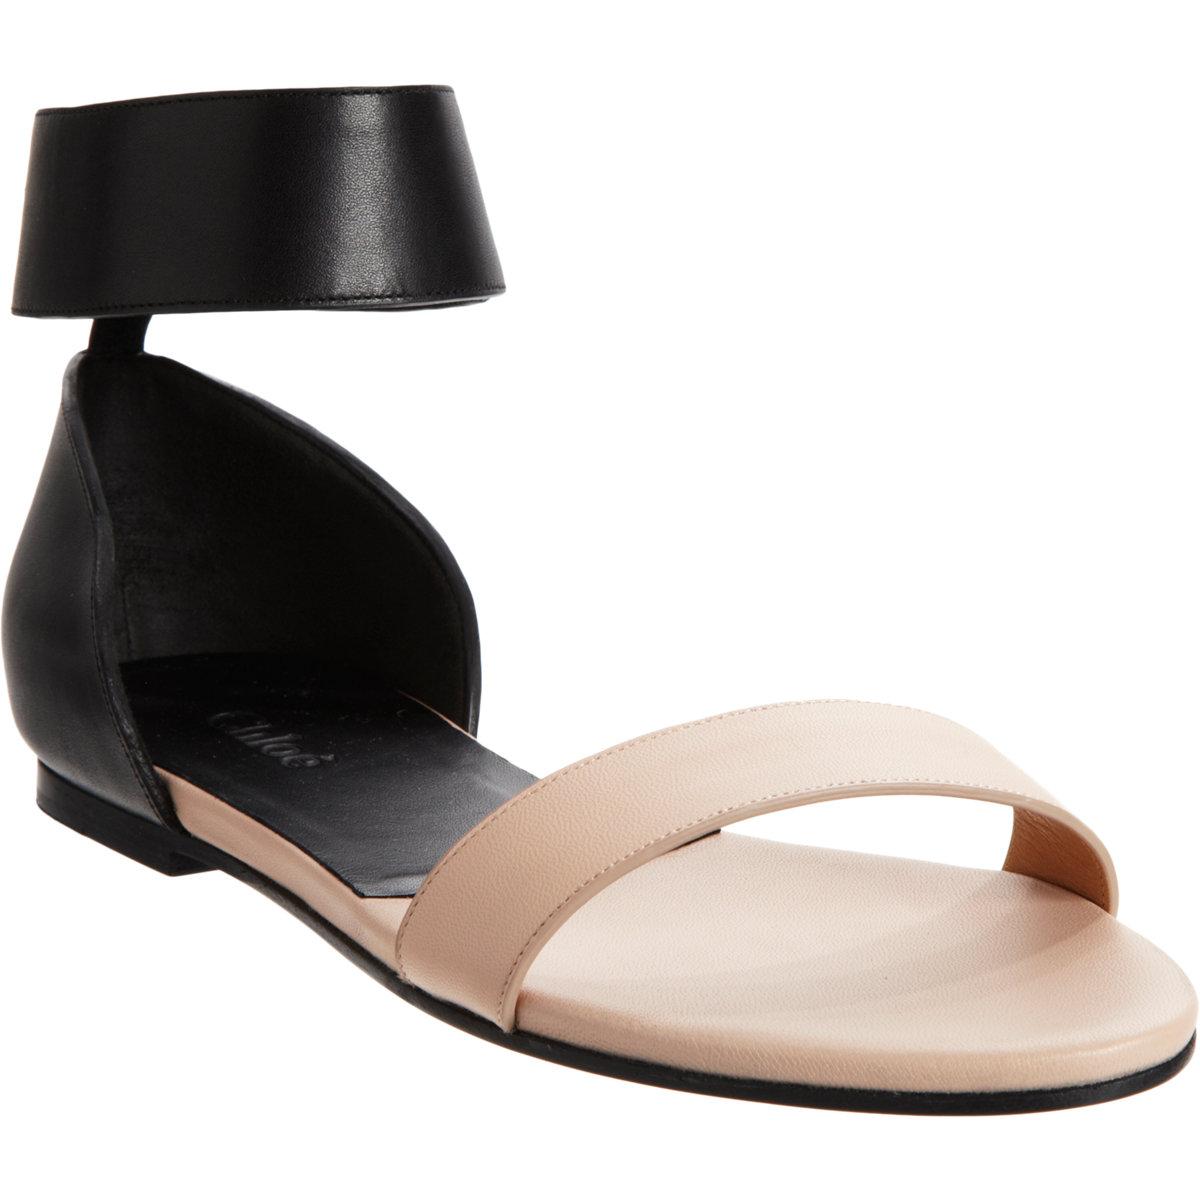 Chloé Two-tone Ankle Strap Sandal in Black - Lyst 1e261720763